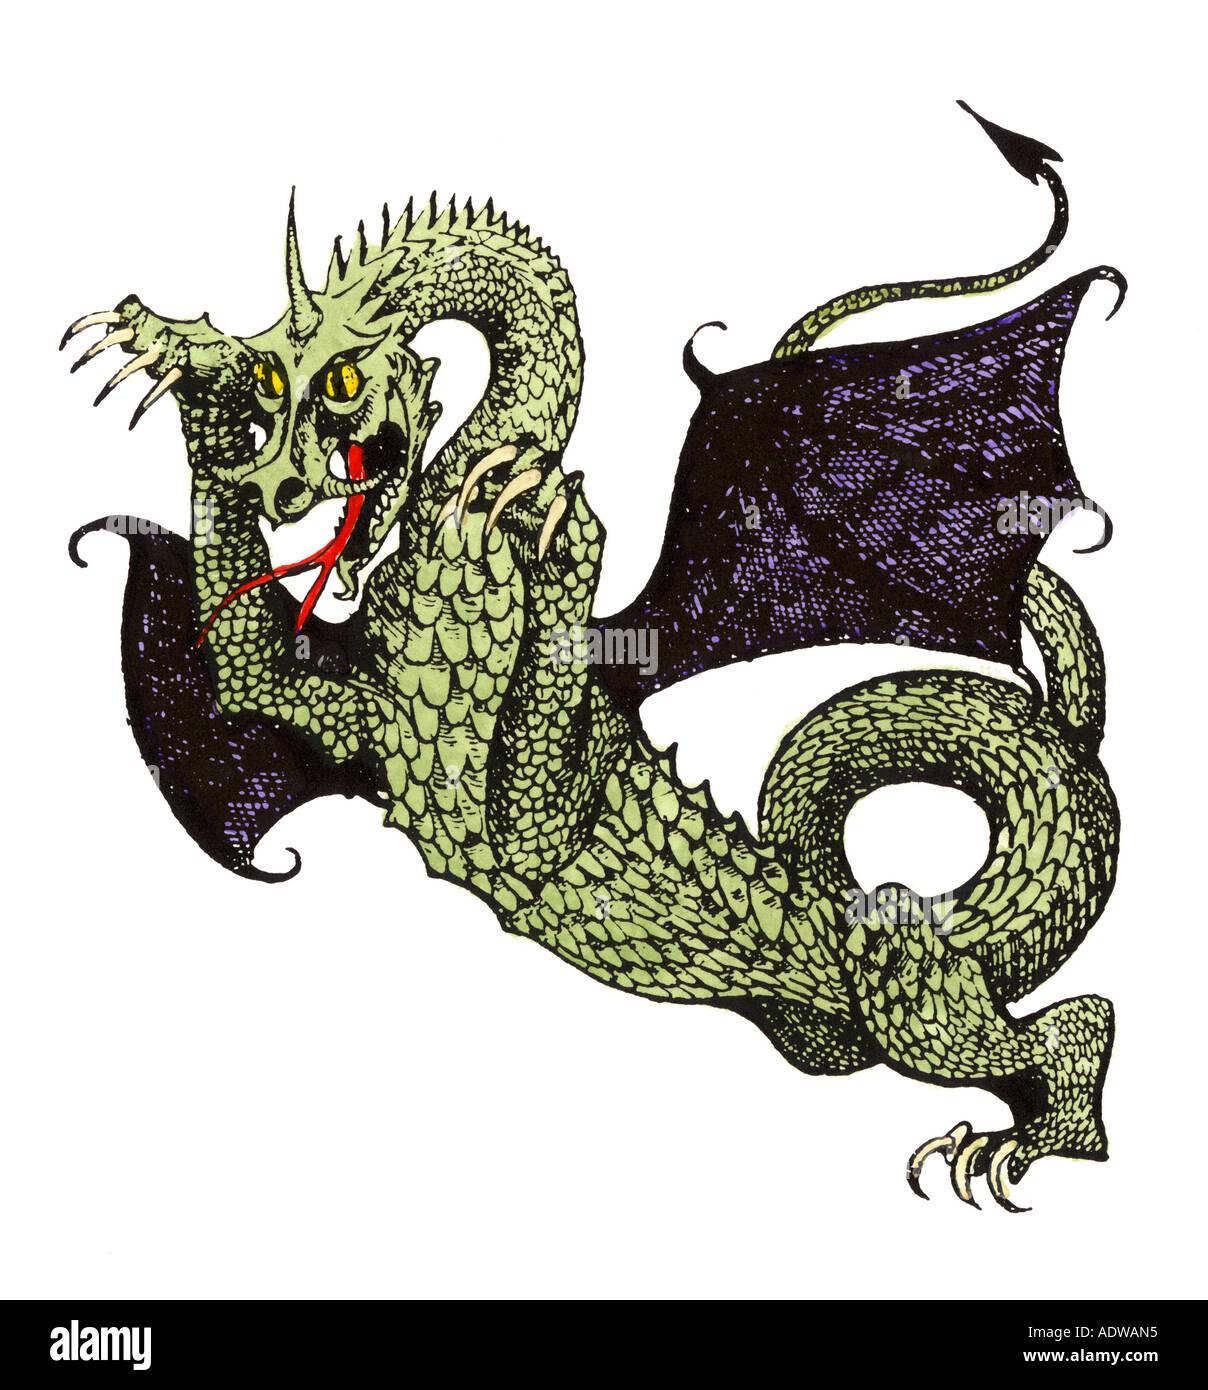 Demonic horned dragon of Hell - Stock Image